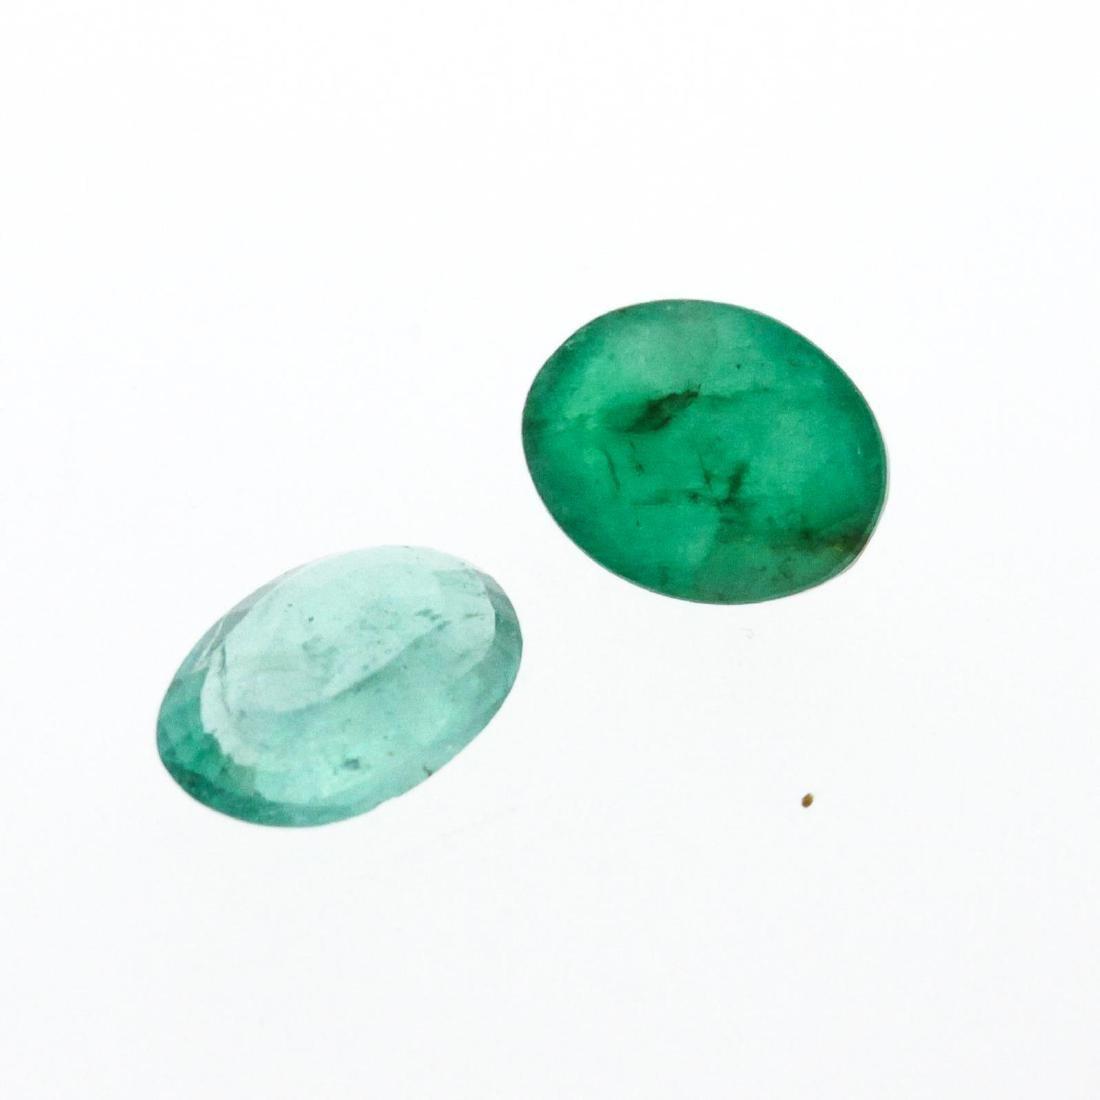 3.02 cts. Oval Cut Natural Emerald Parcel